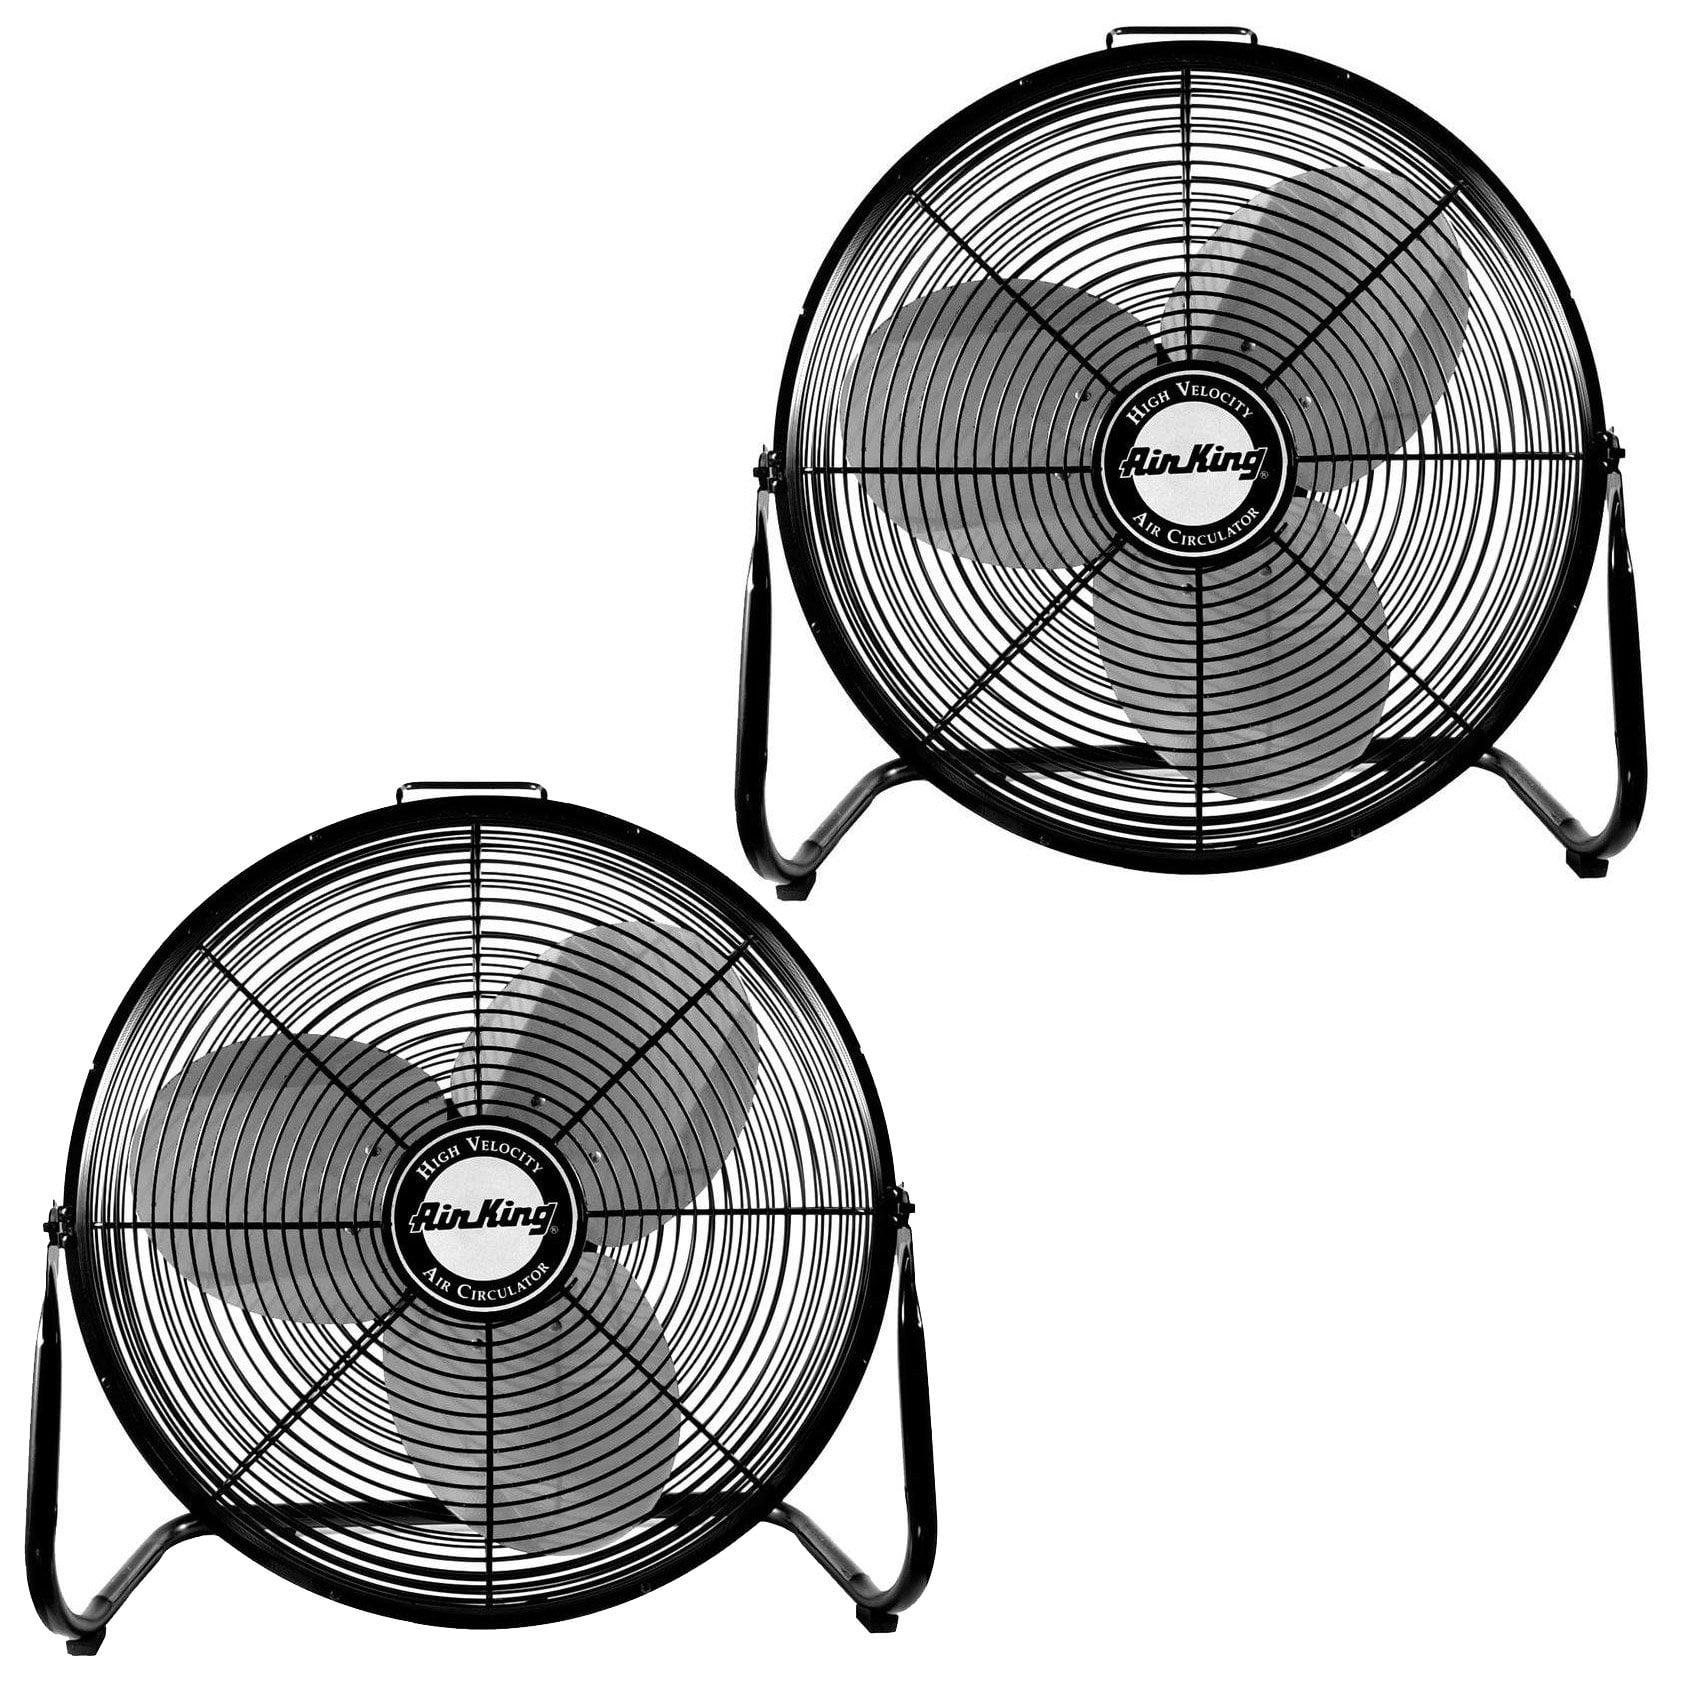 "Air King 18"" 1/6 HP 3 Speed Heavy Duty Portable Industrial Floor Fan (2 Pack)"